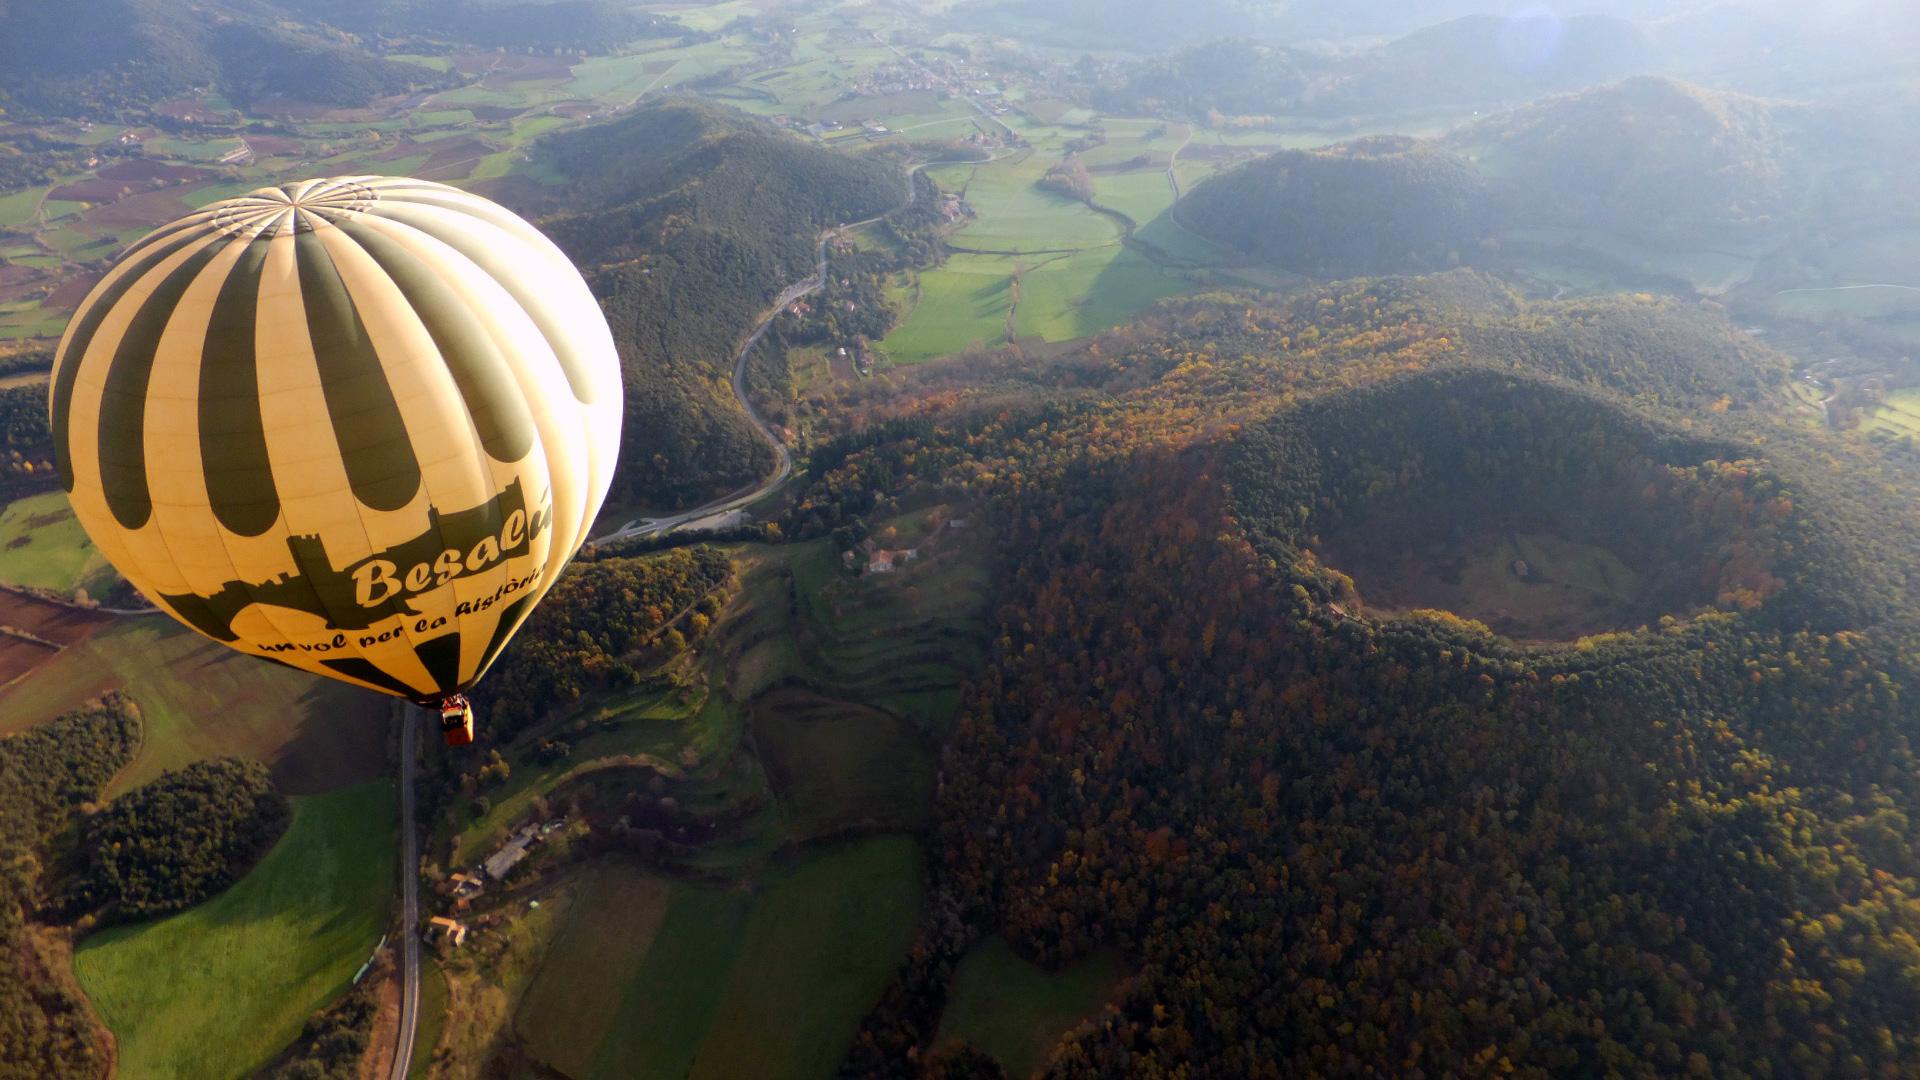 Vol en Montgolfière au-dessus de la Zone Volcanique de la Garrotxa